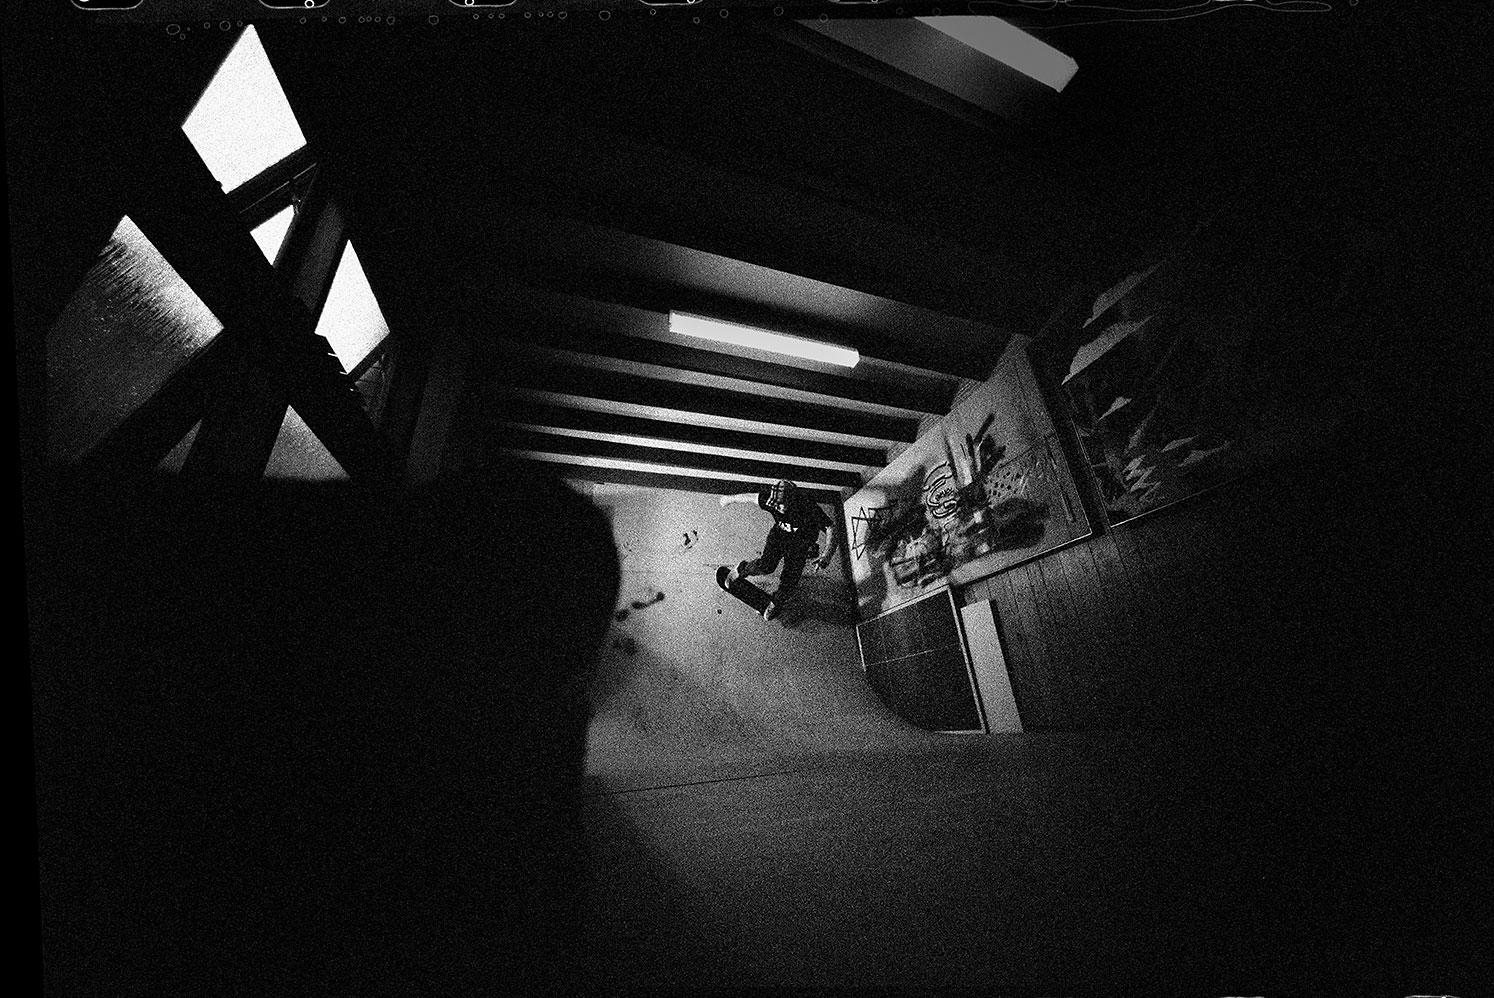 Chris Pond, Lounge Room Wallride, Frenchs Forest, NSW, Silver Gelatin Print, 50.8cm x 60.1cm, 1/5